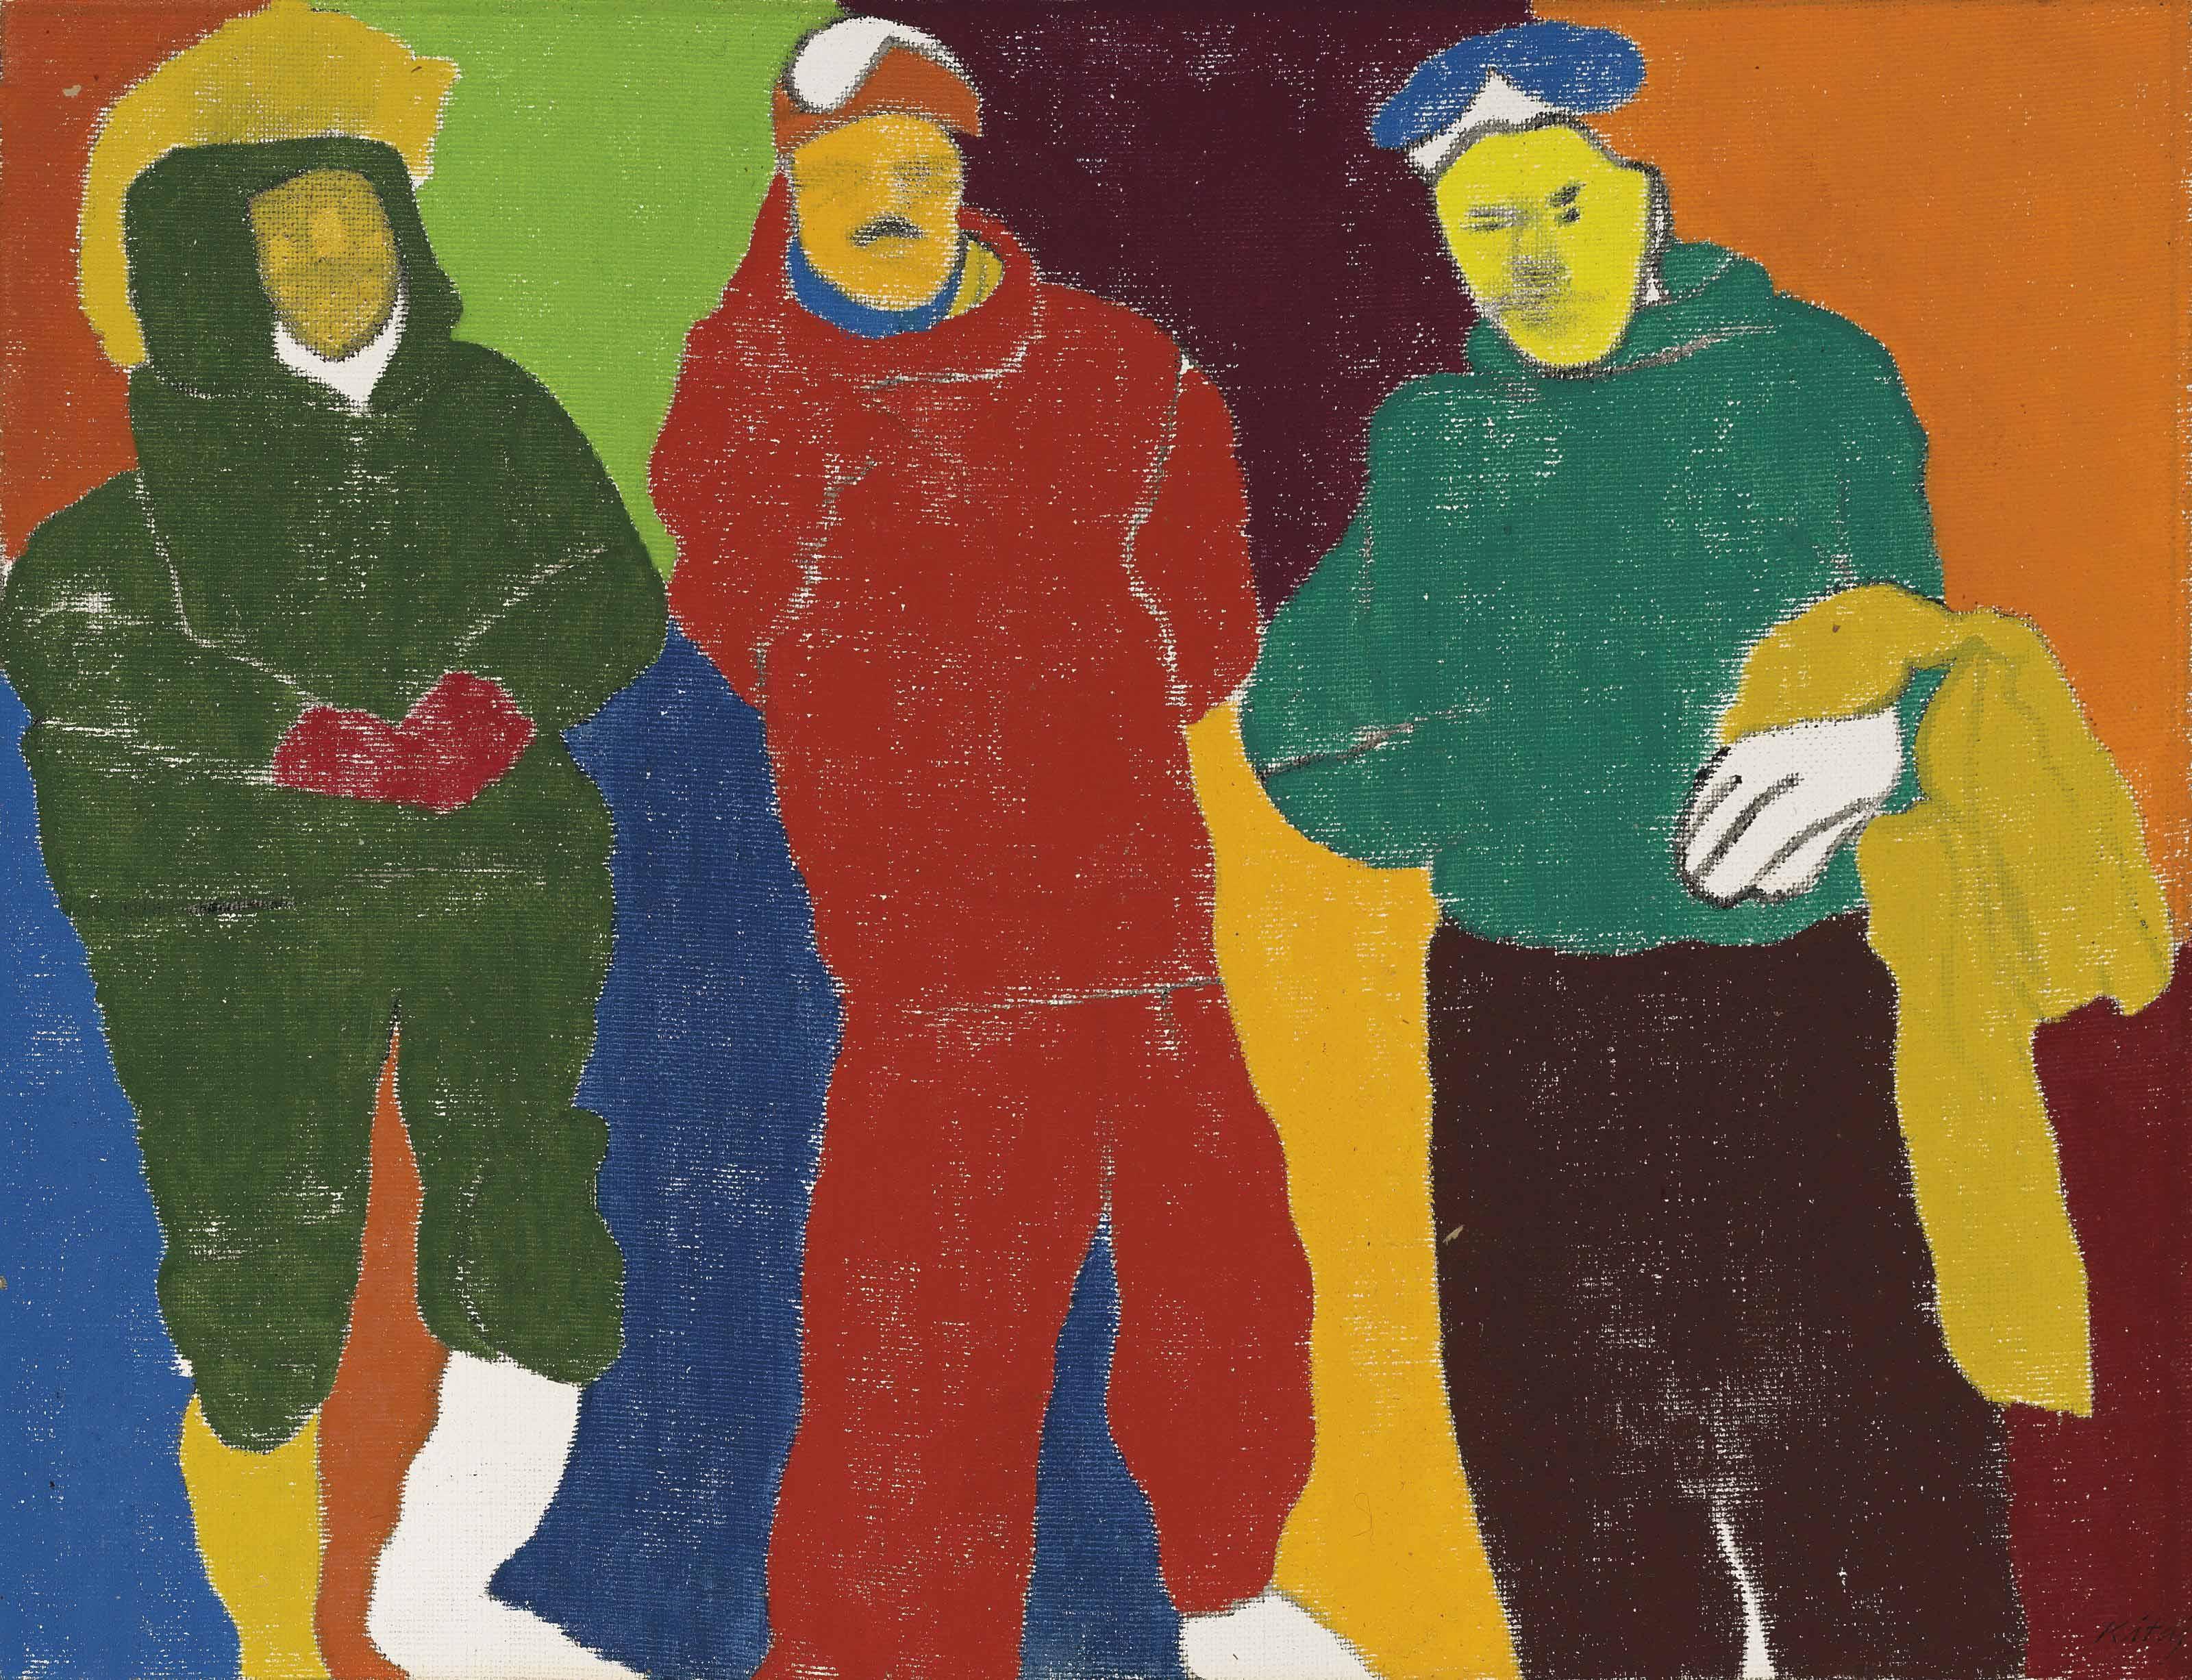 History of Art: R. B. Kitaj